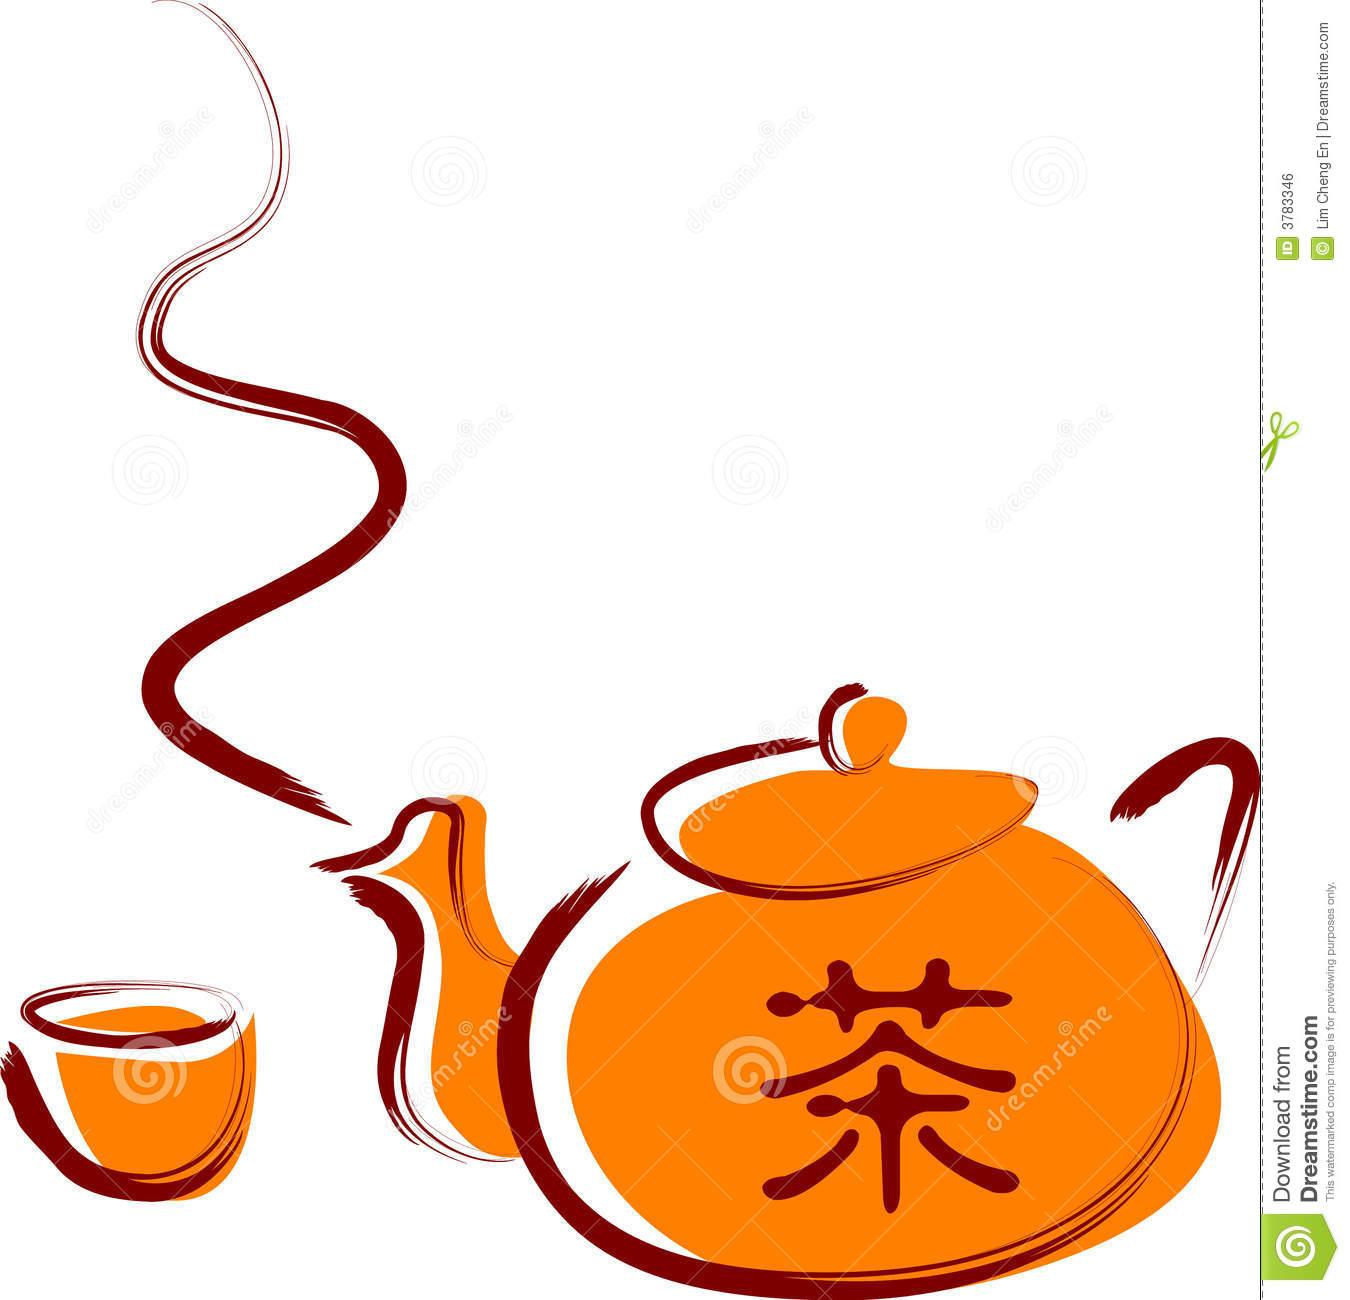 Chinese tea stock vector. Illustration of smoke, traditional.